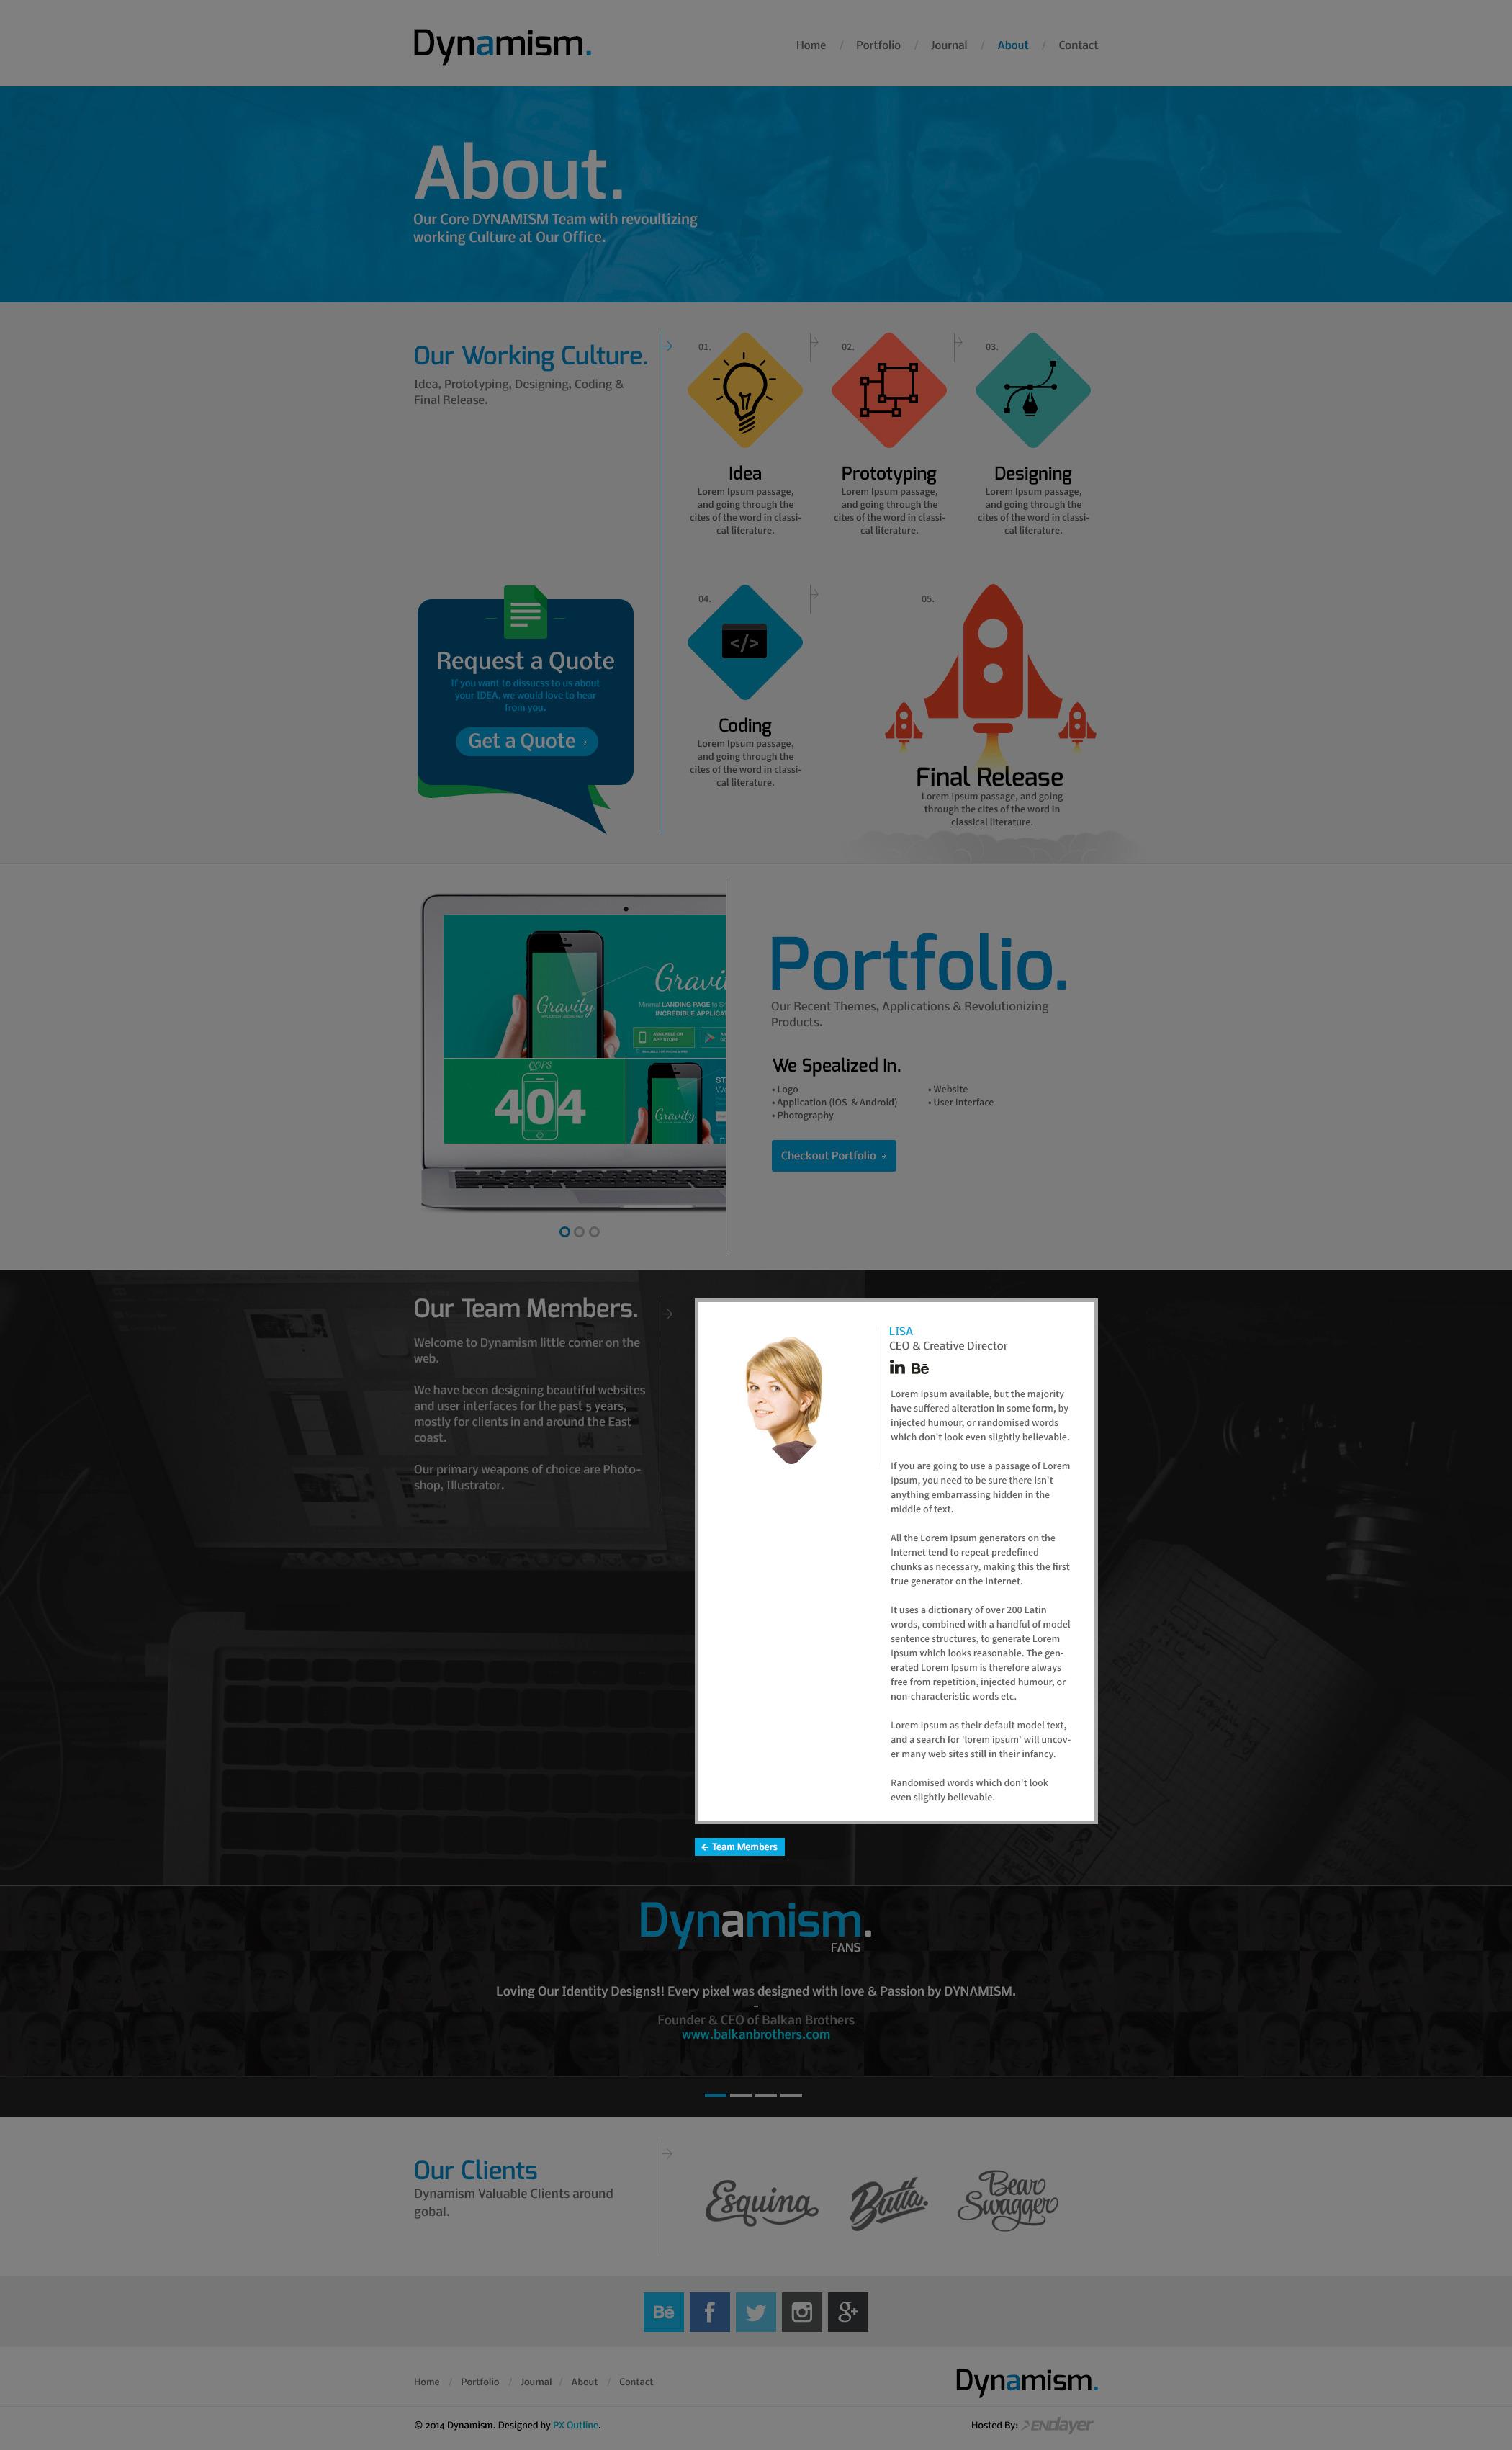 Dynamism a Creative Portfolio Theme (PSD) by pxoutline